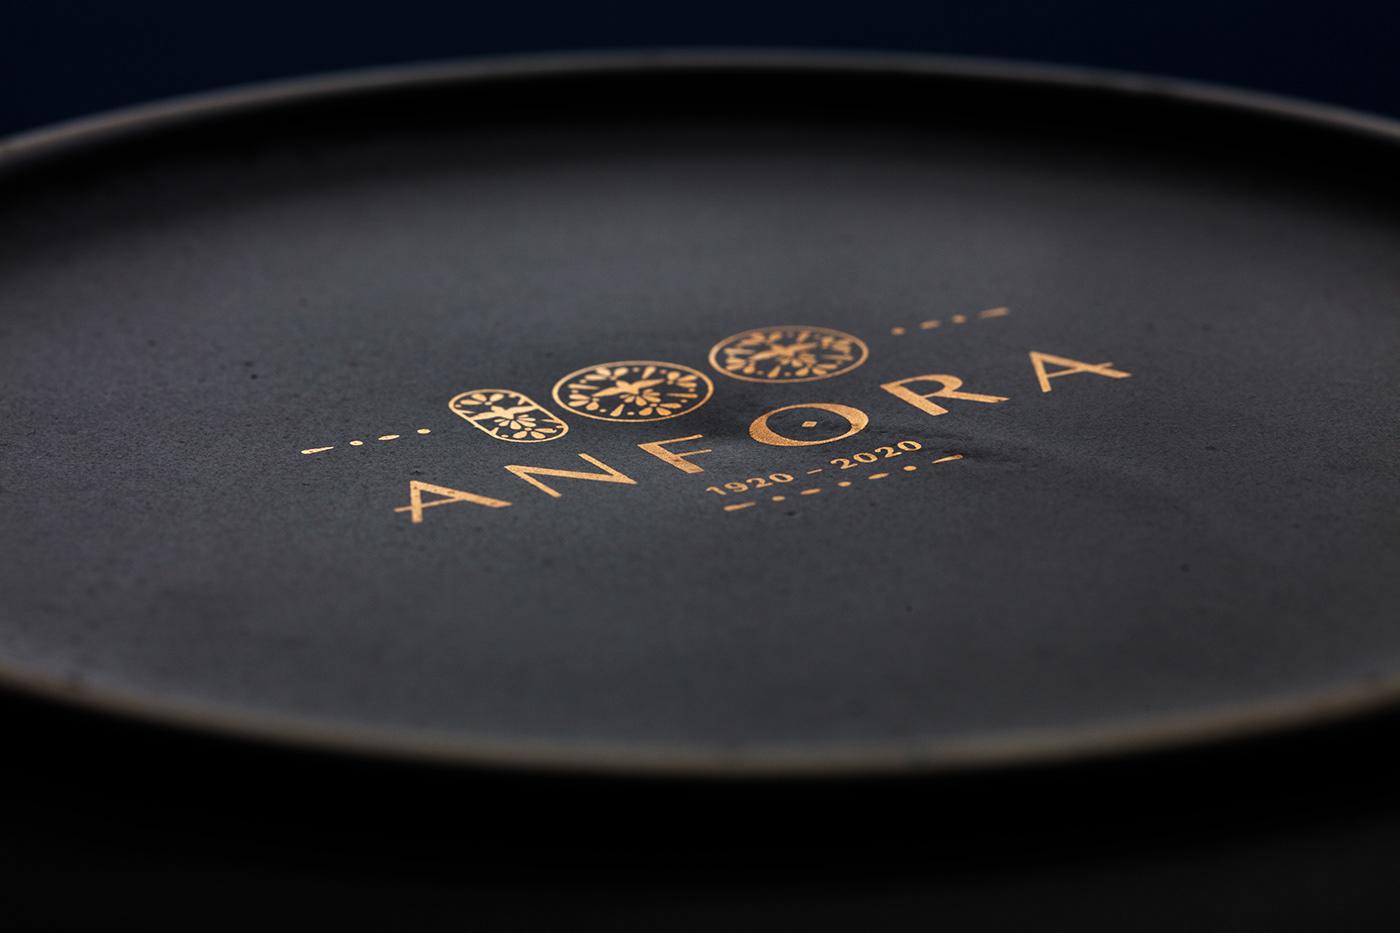 Anfora陶瓷品牌100周年视觉形象w88手机官网平台首页